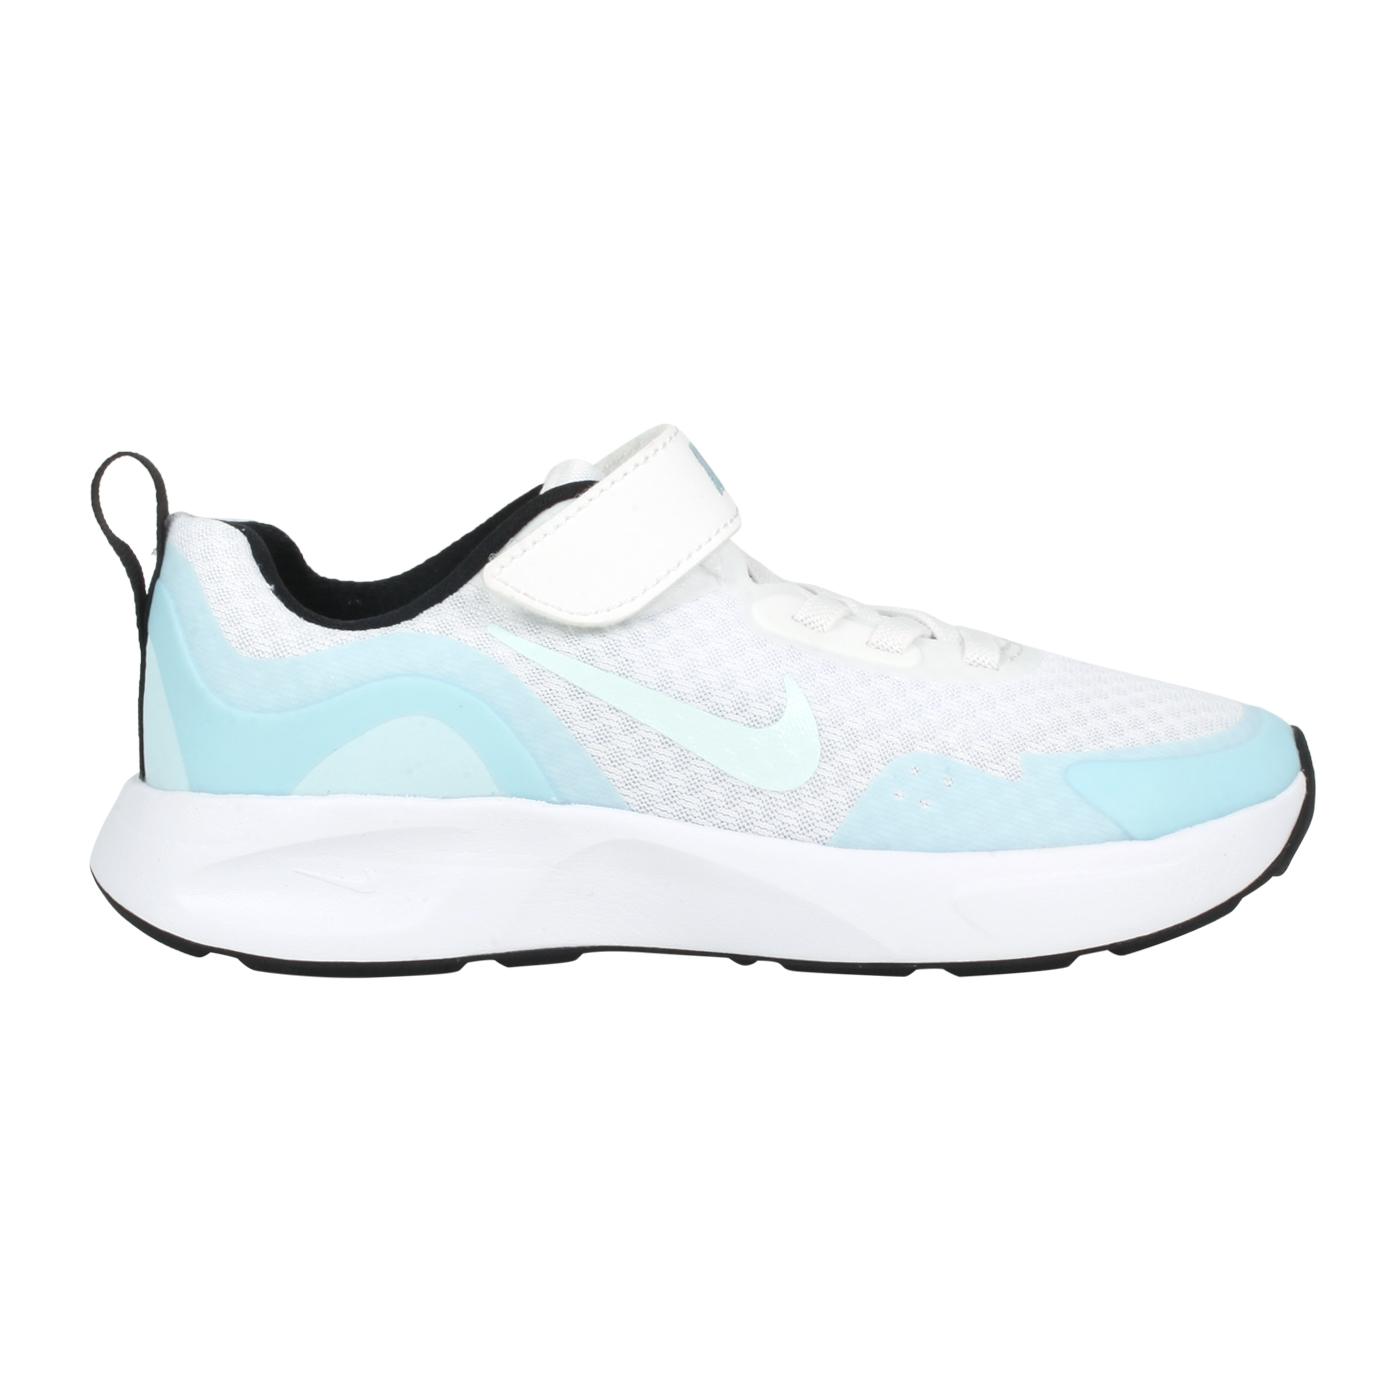 NIKE 中童運動休閒鞋  @WEARALLDAY (PS)@CJ3817102 - 白淺藍綠